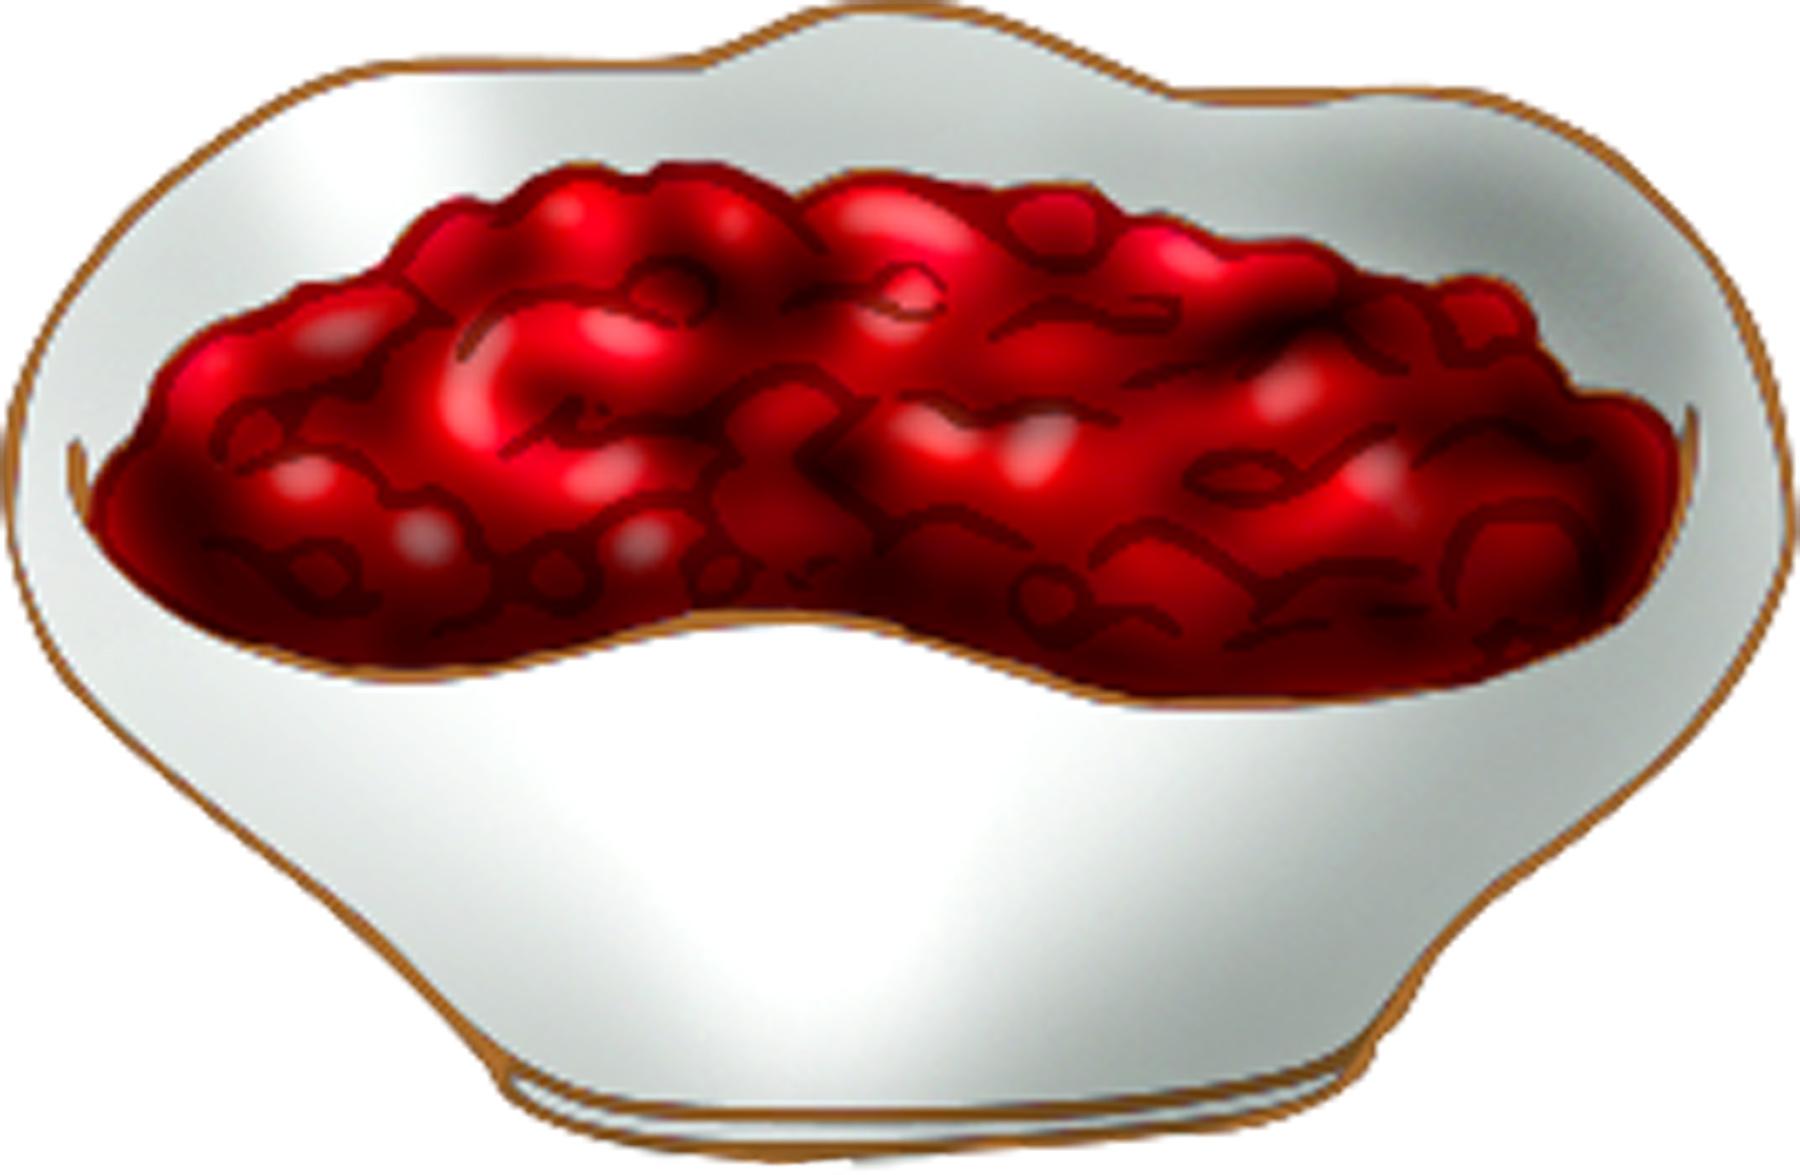 Thanksgiving cranberry clipart banner transparent stock Free Transparent Cranberry Cliparts, Download Free Clip Art ... banner transparent stock